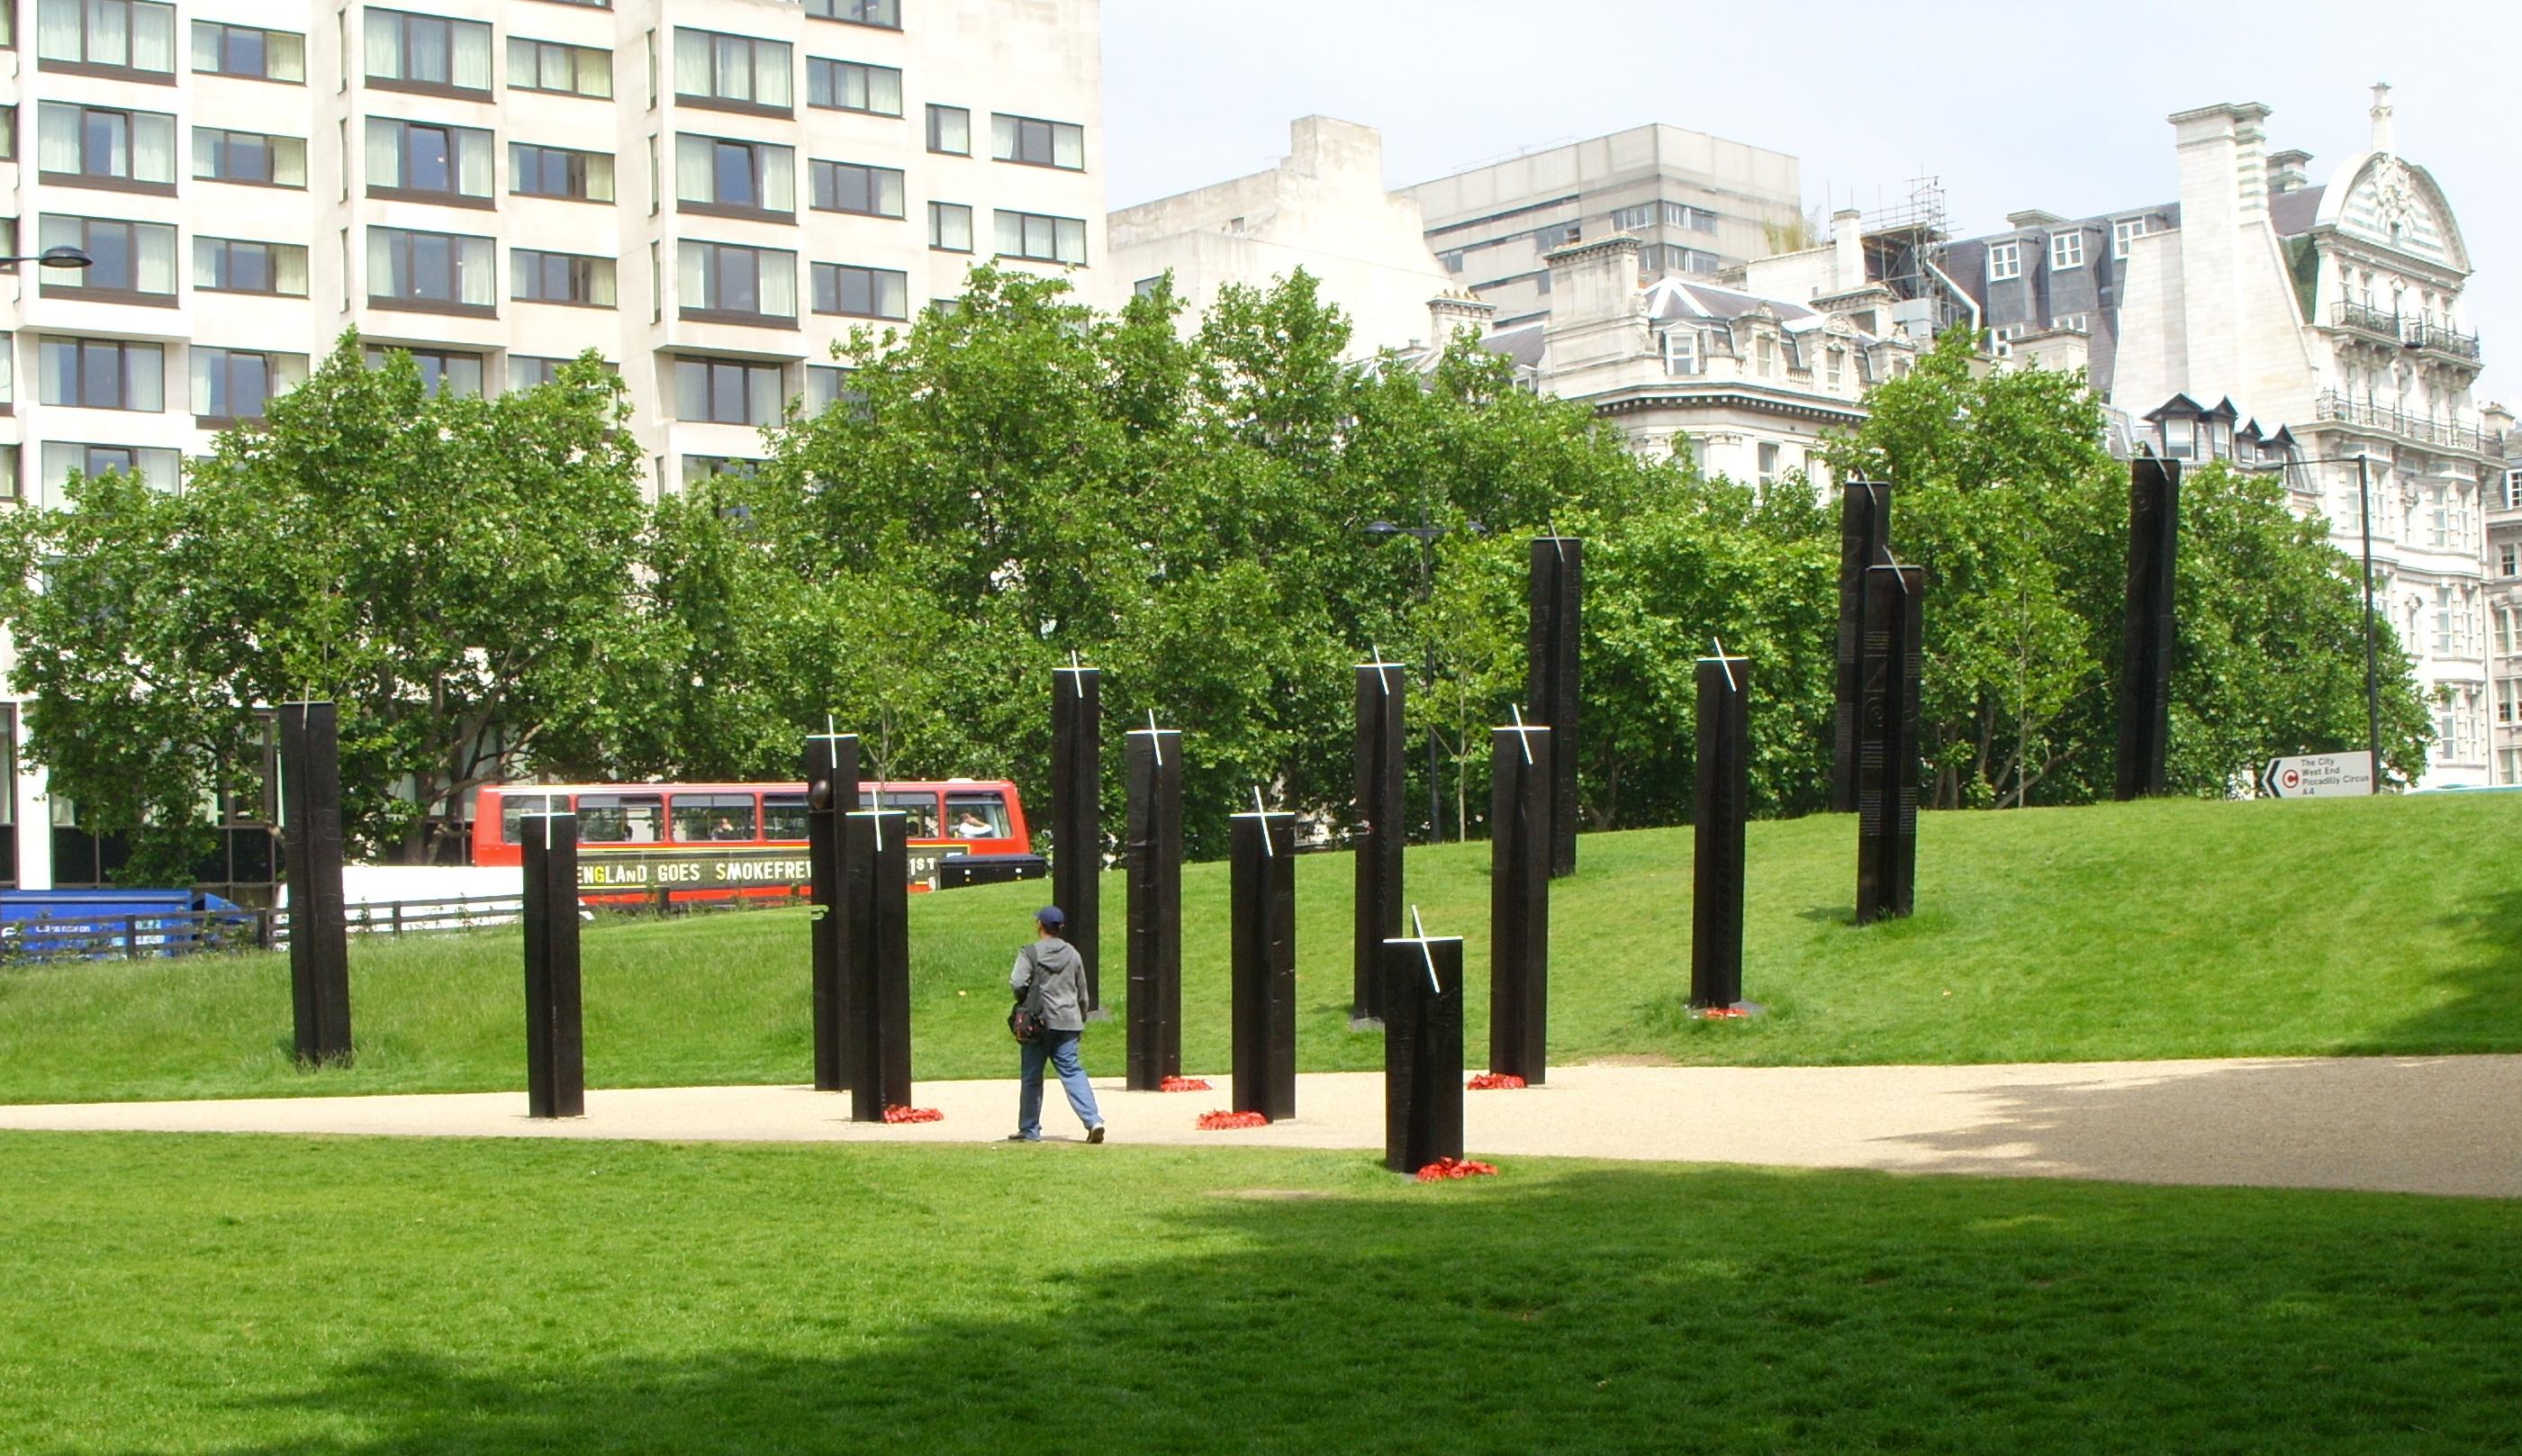 File:NZ war memorial, London JPG - Wikimedia Commons